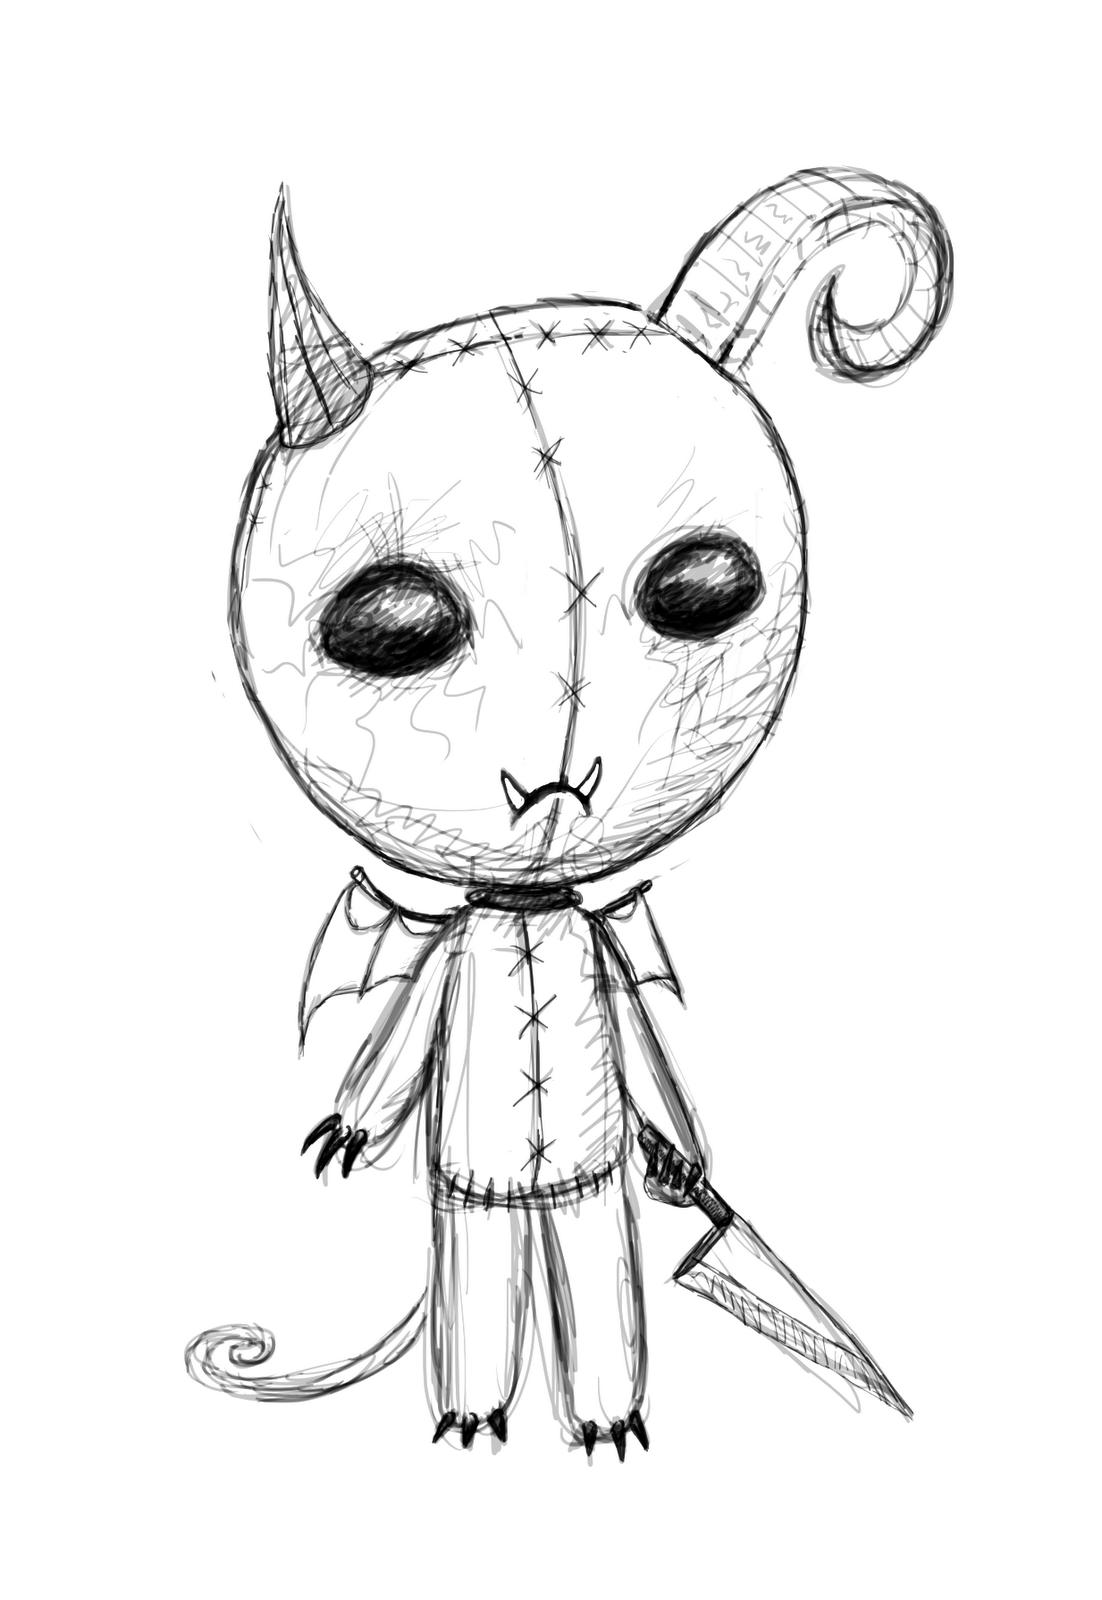 monsterdrawings | Horror Shock LoliPOP: Hug A Monster Day ...